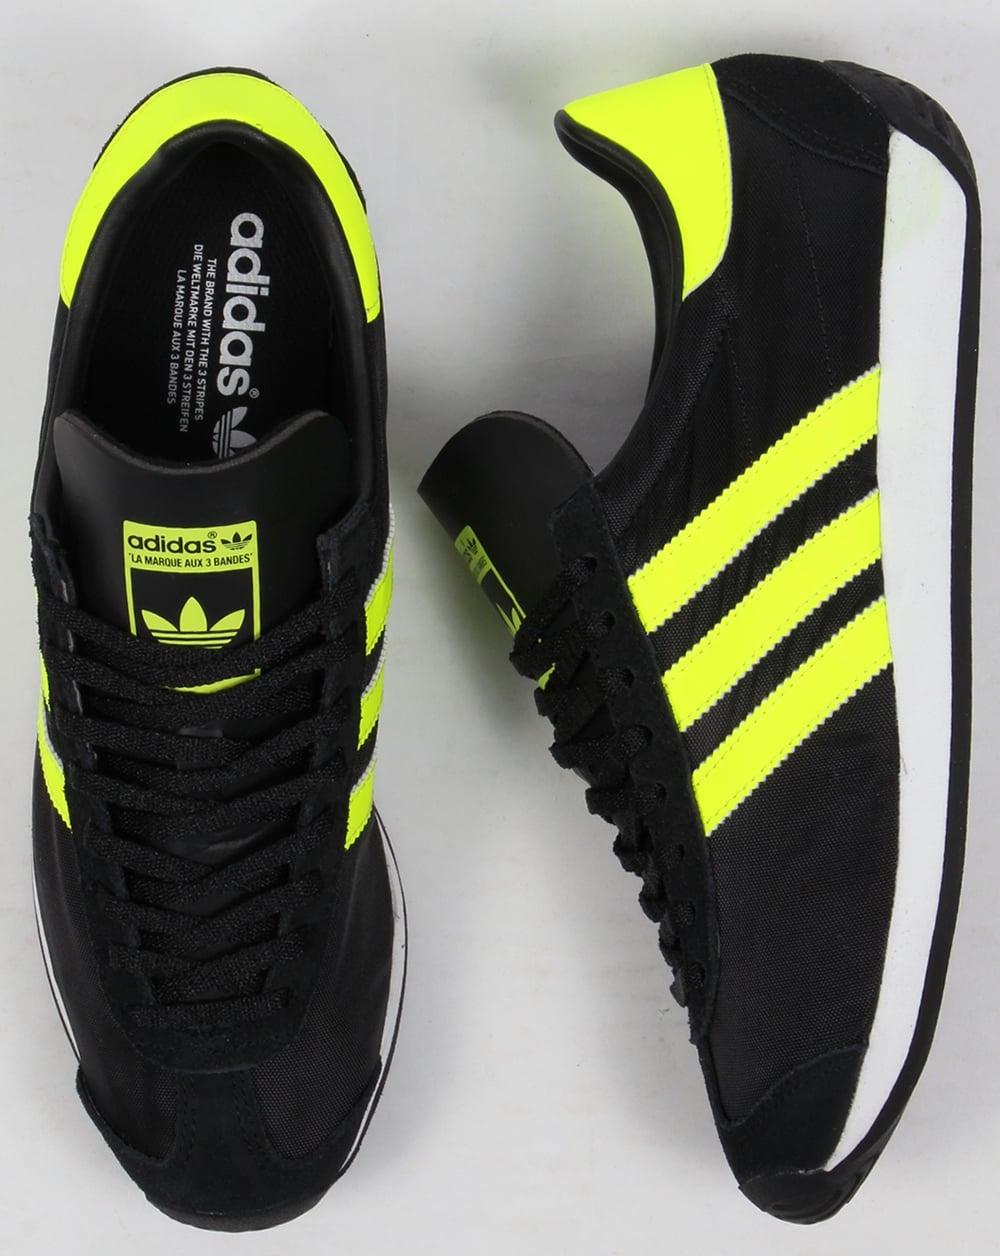 Adidas paese og formatori nero / solare gialla, originali, scarpe, Uomo